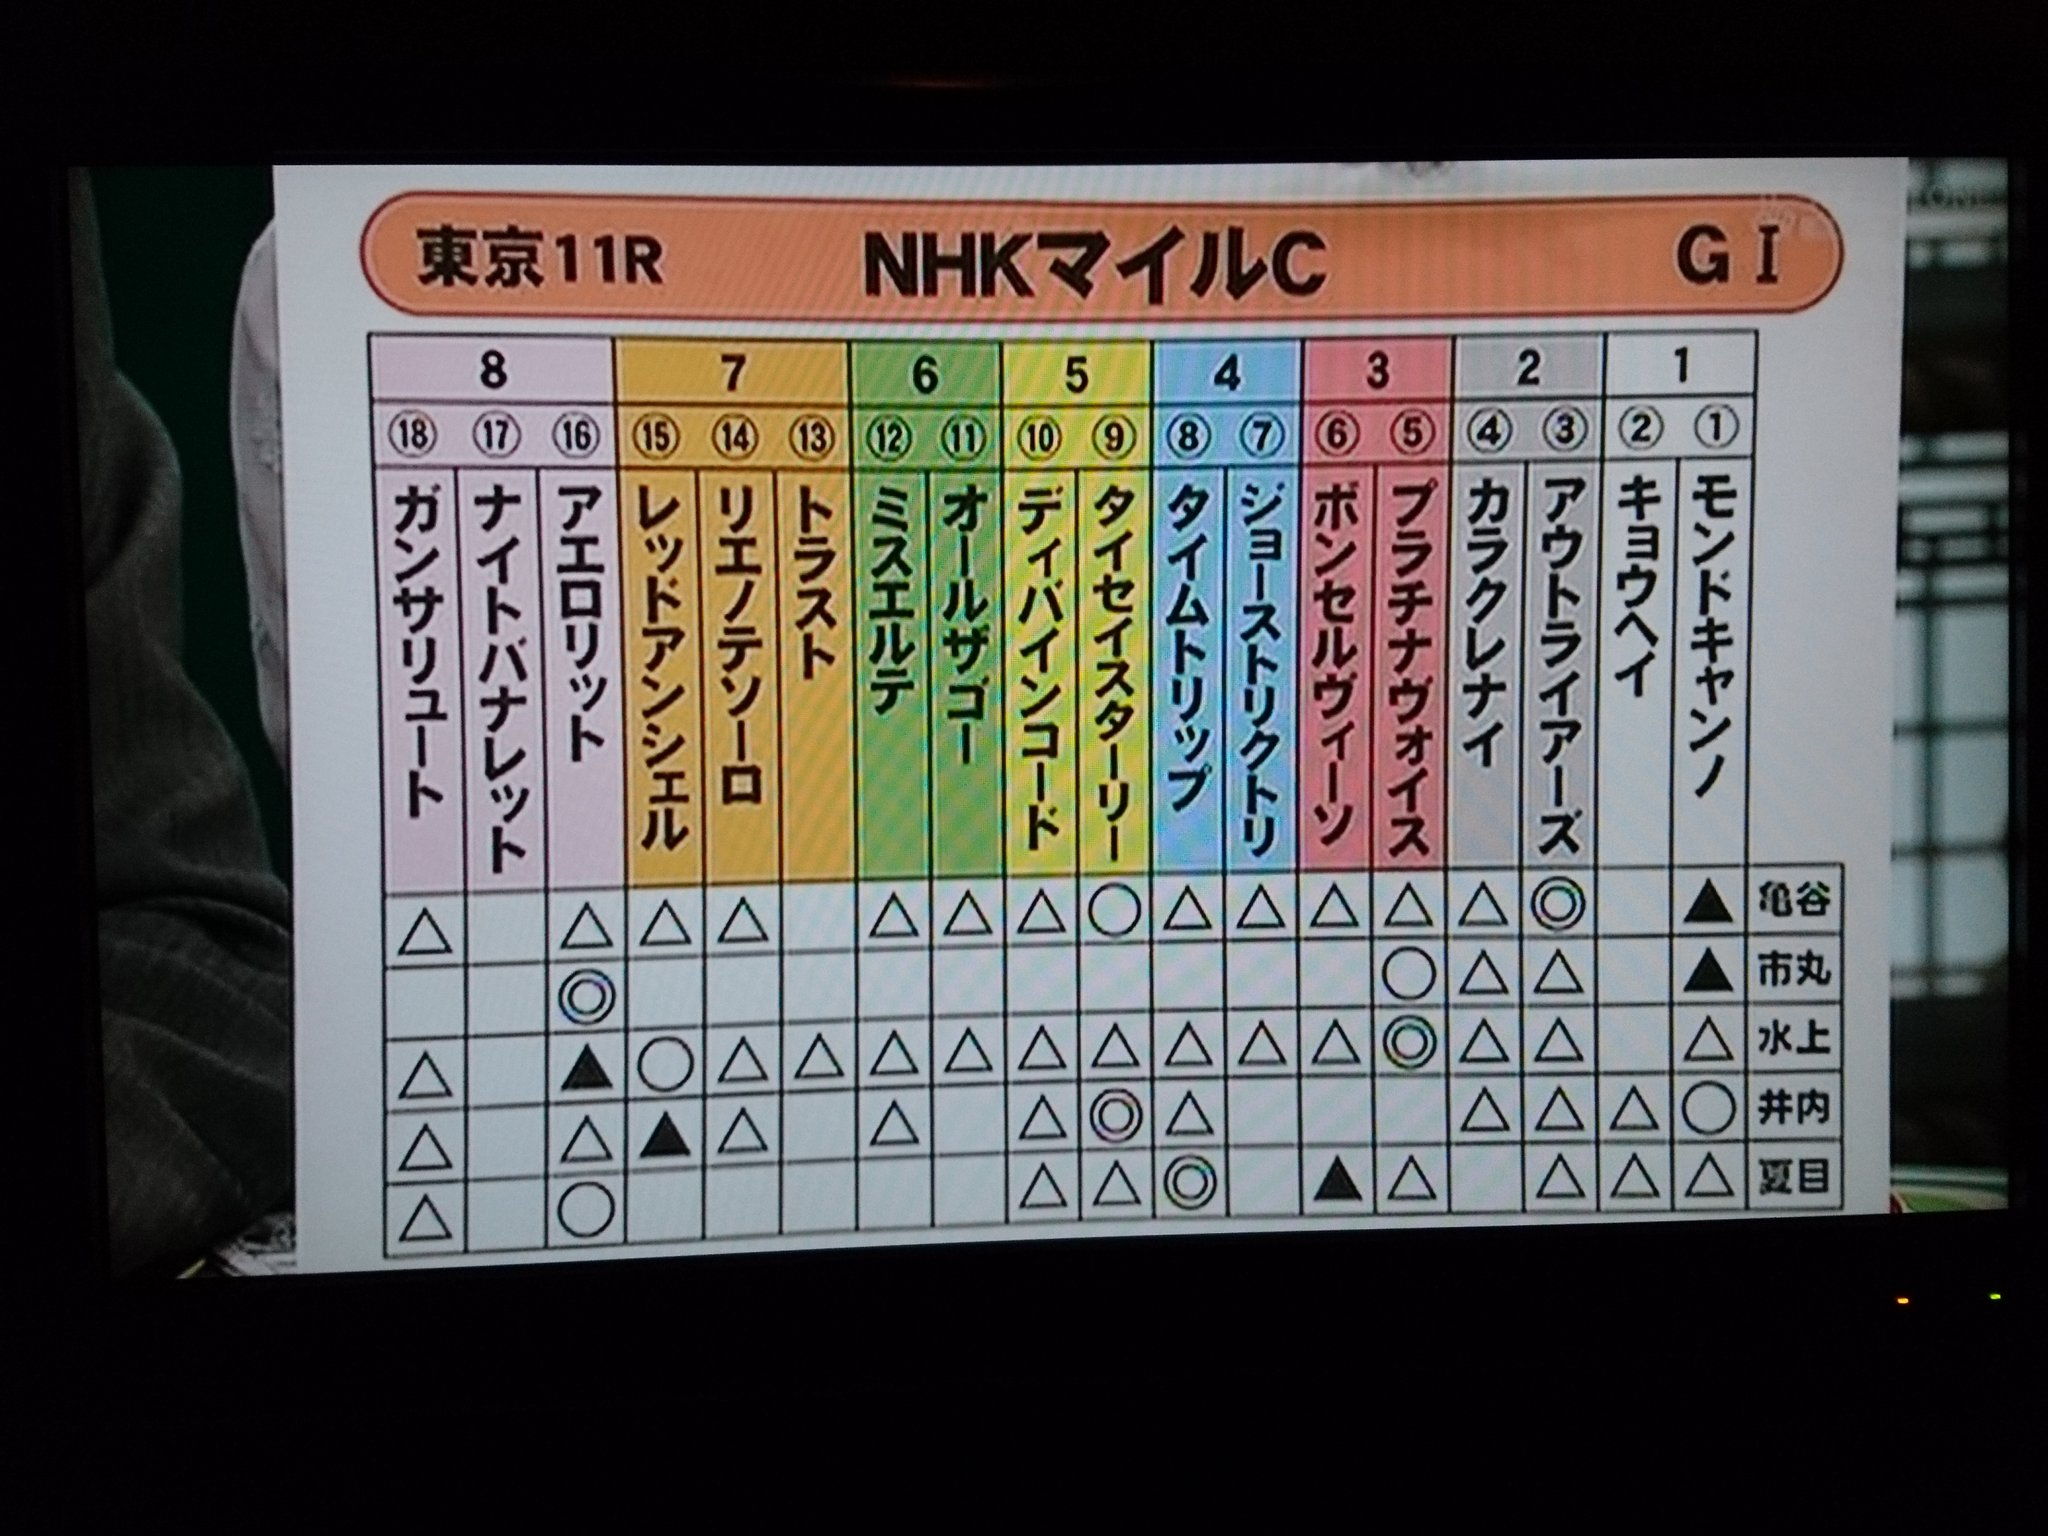 http://livedoor.blogimg.jp/demuchi/imgs/2/9/297b2bcf.jpg